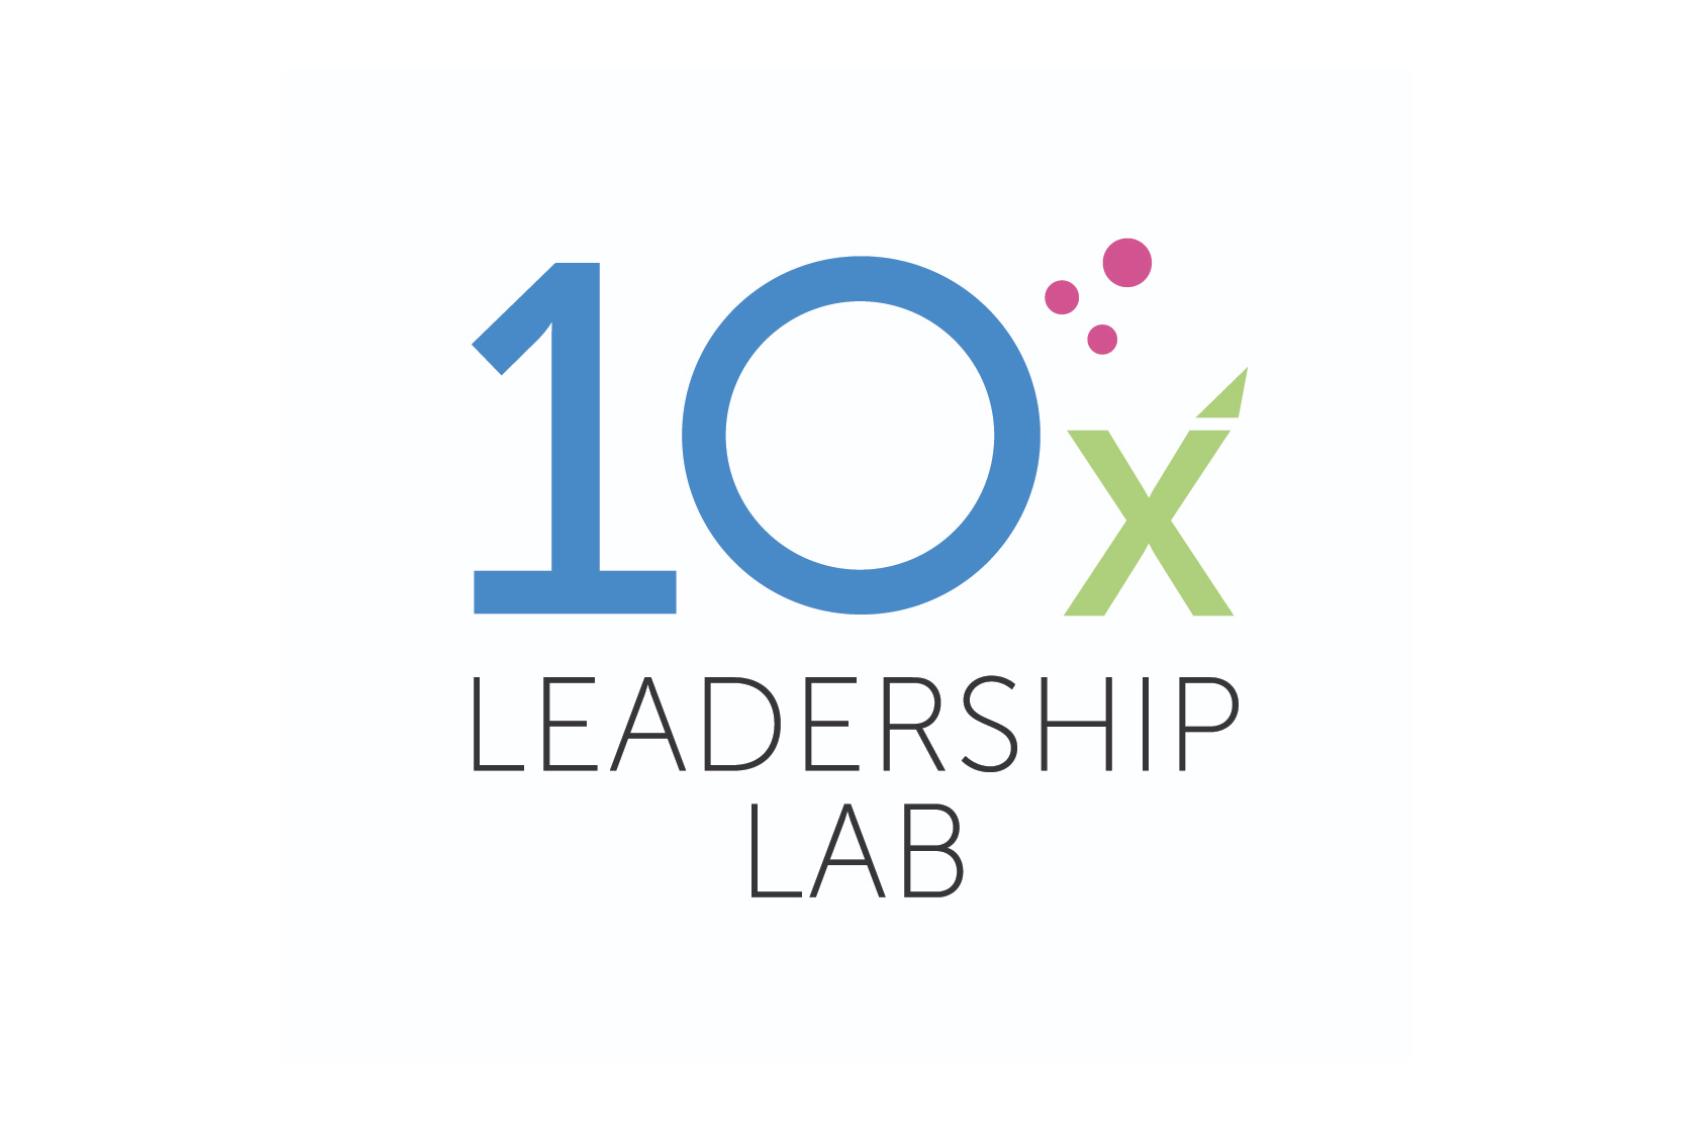 10x Leadership Lab